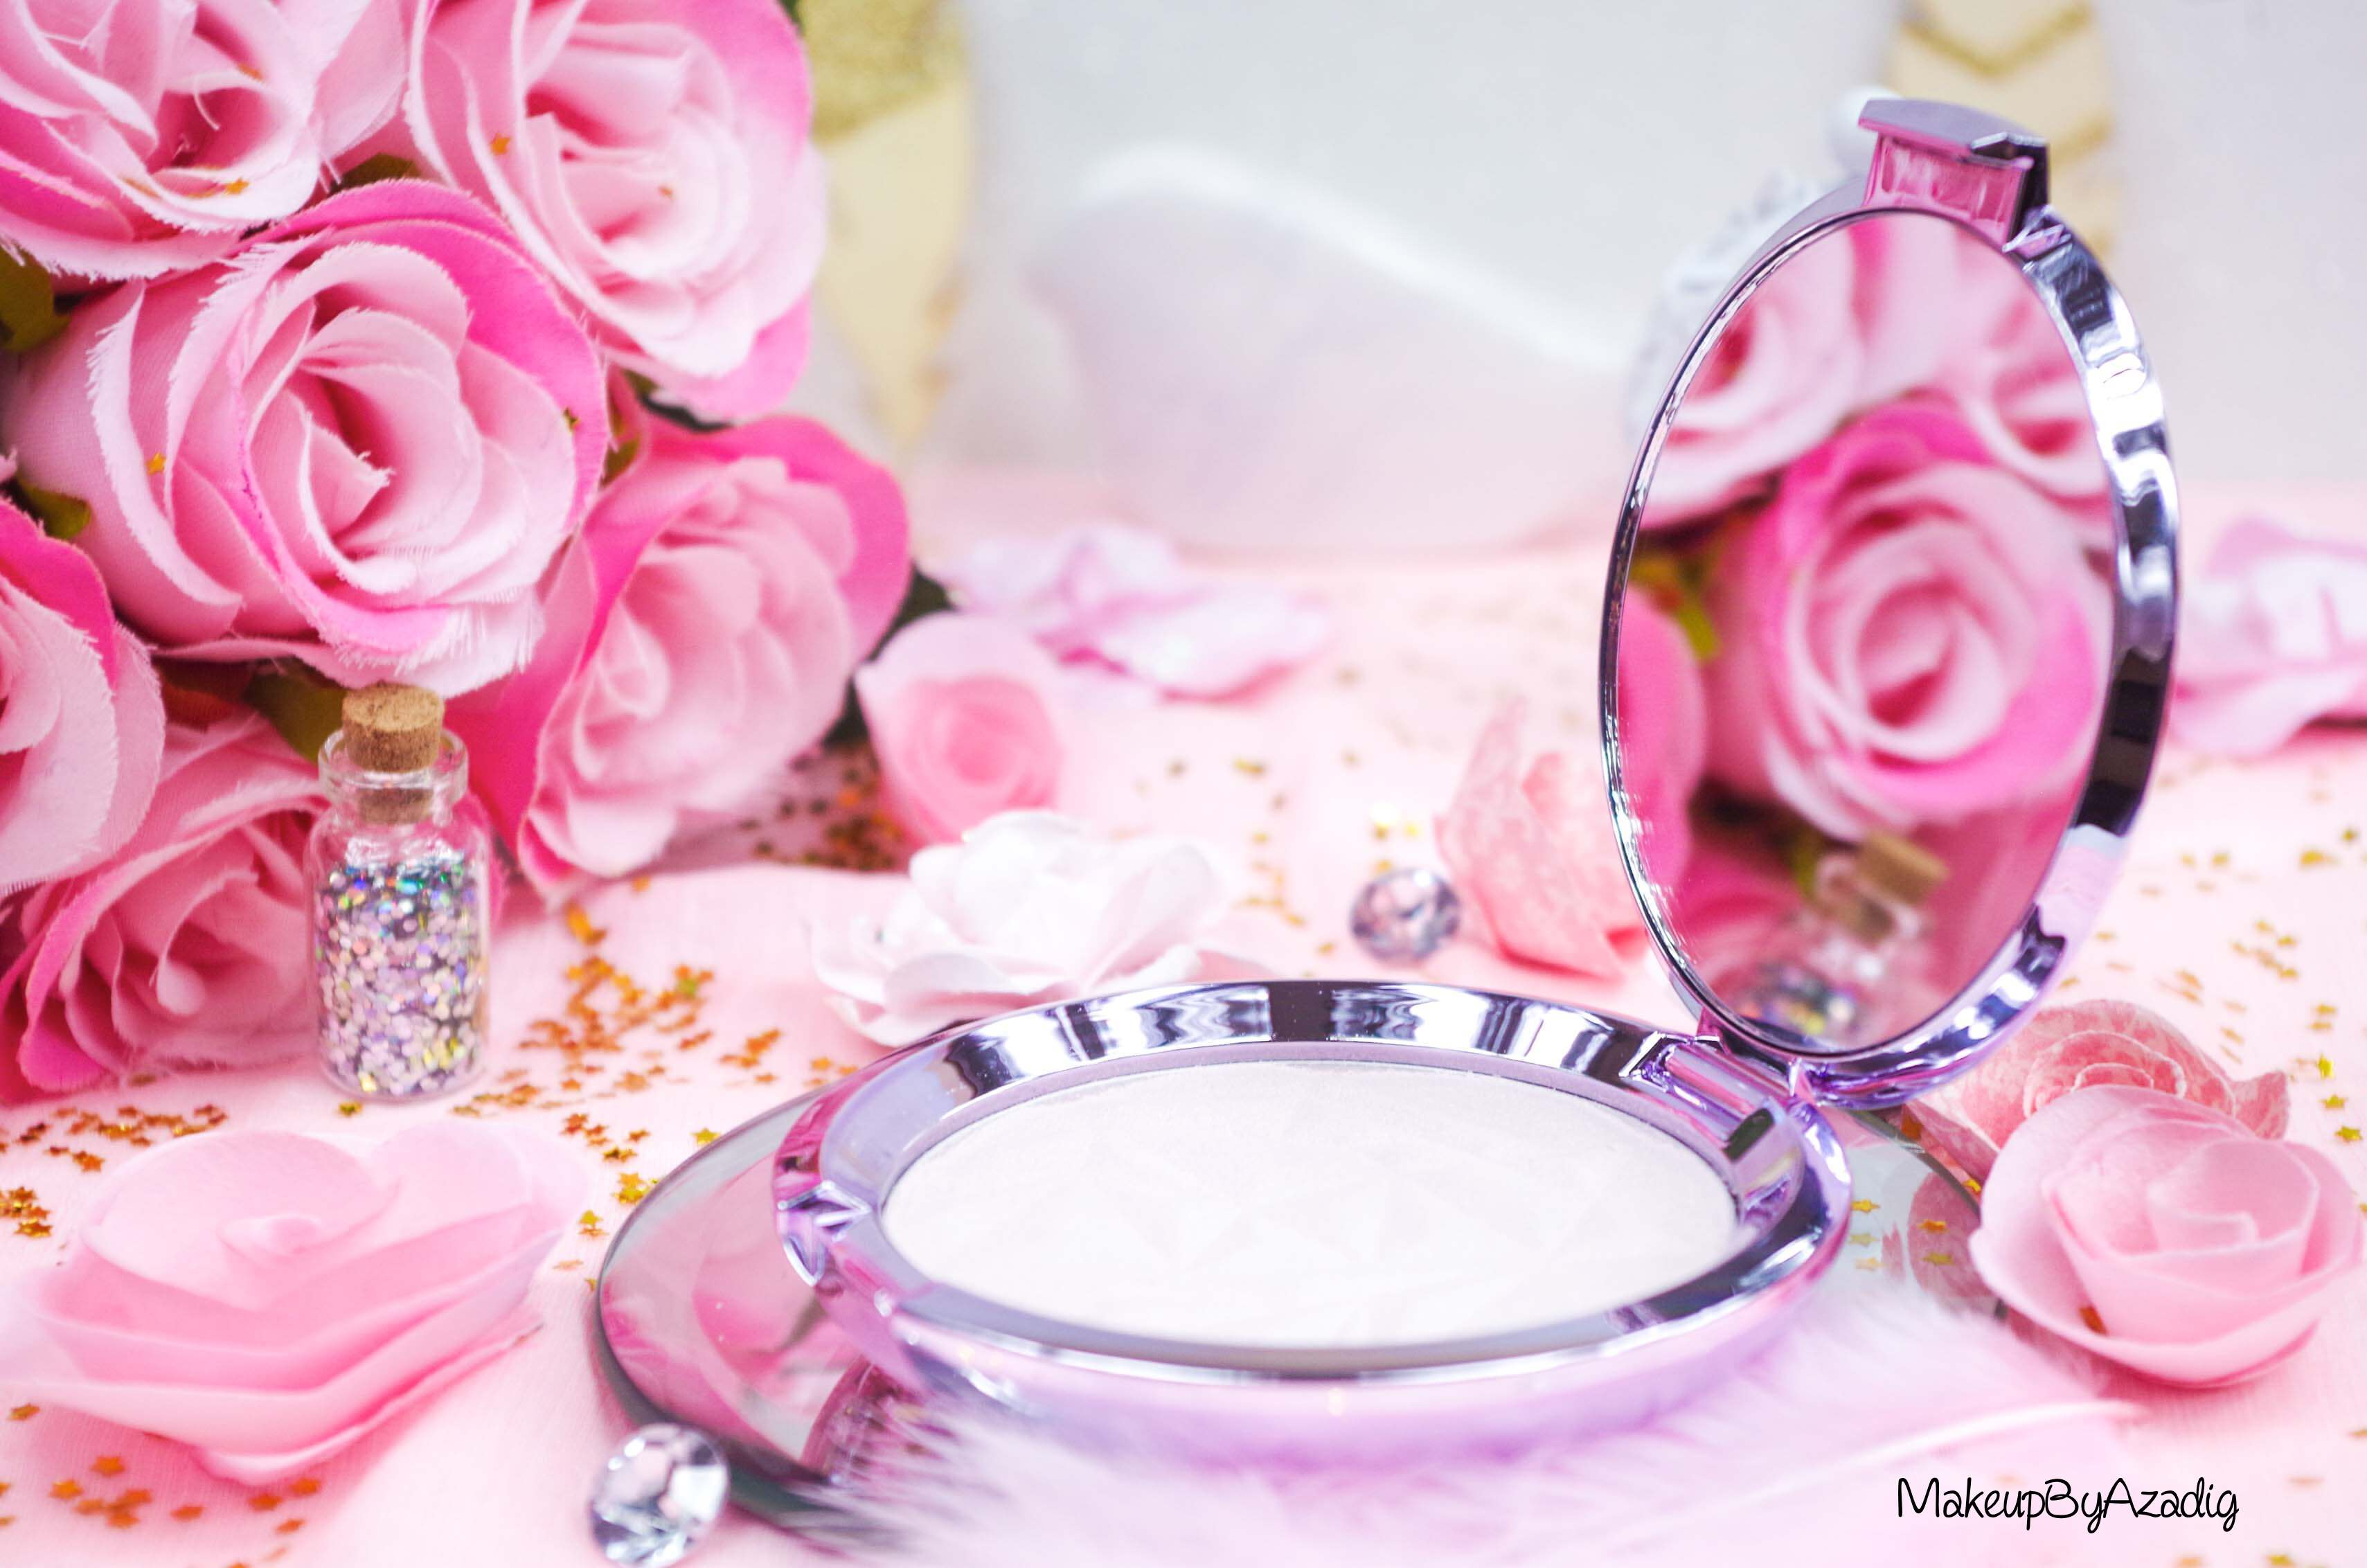 revue-becca-shimmering-skin-perfector-pressed-highlighter-enlumineur-violet-prismatic-amethyst-avis-swatch-prix-makeupbyazadig-roses